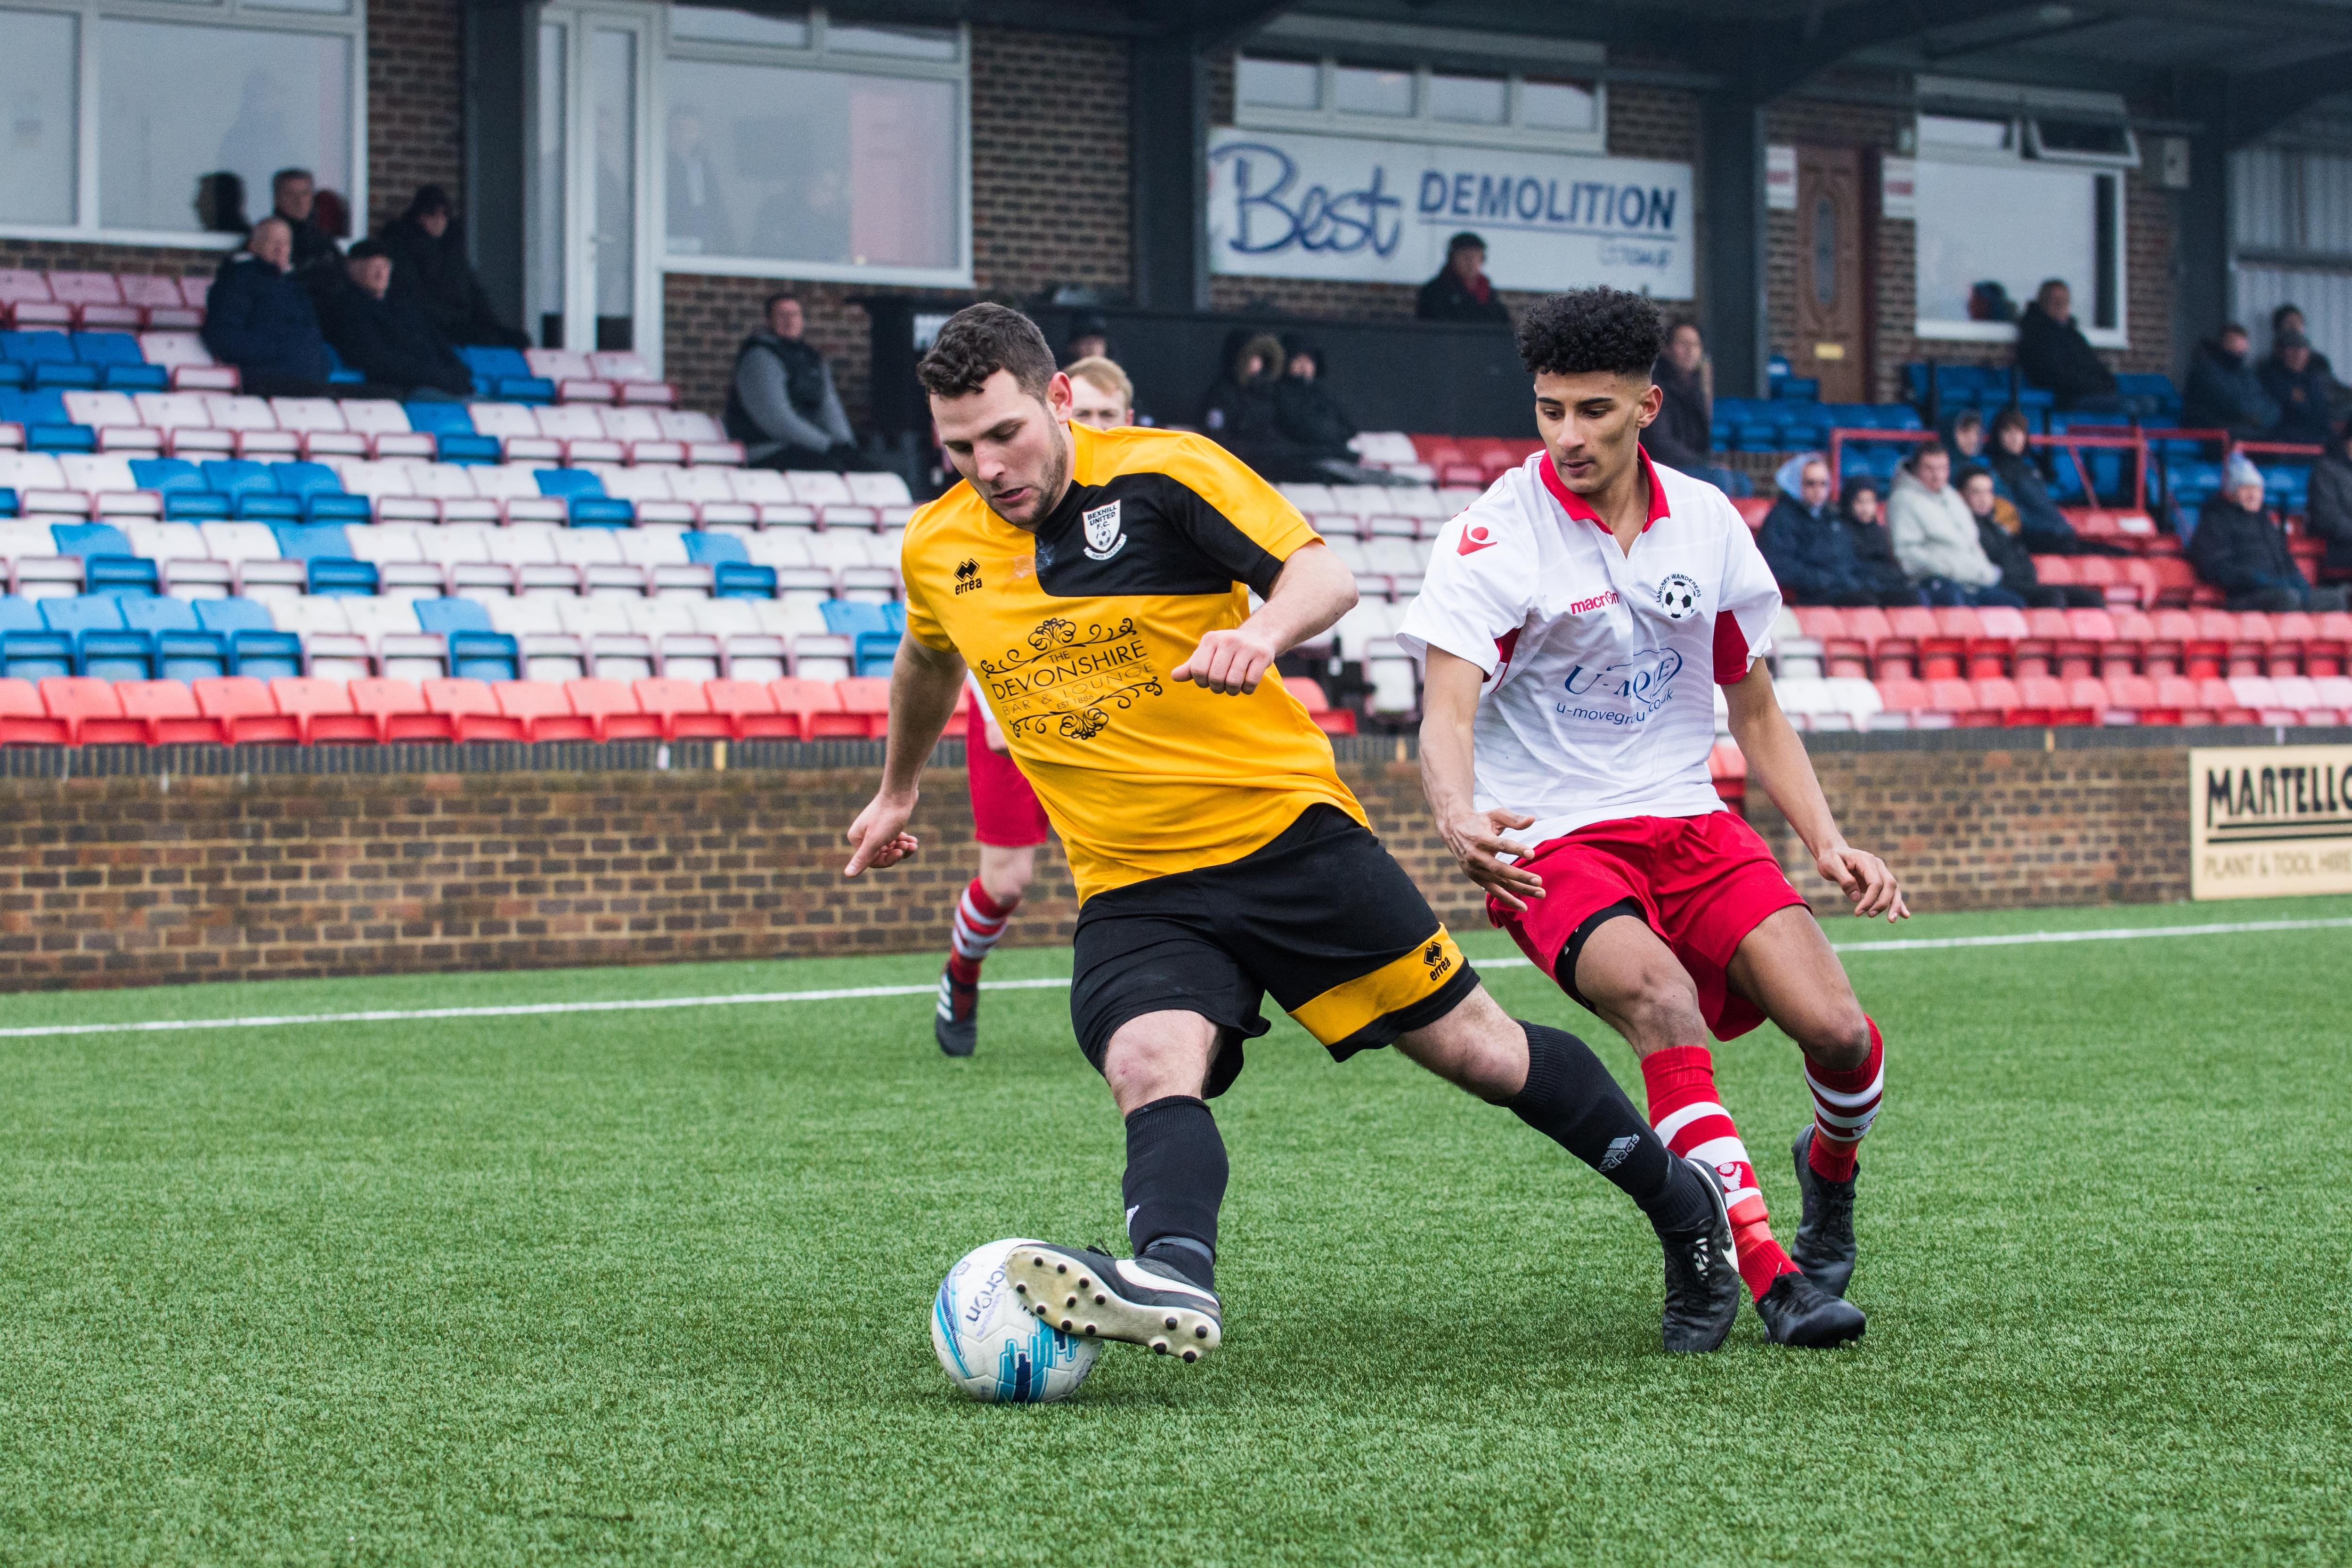 DAVID_JEFFERY Langney Wanderers FC vs Bexhill United FC 03.03.18 49